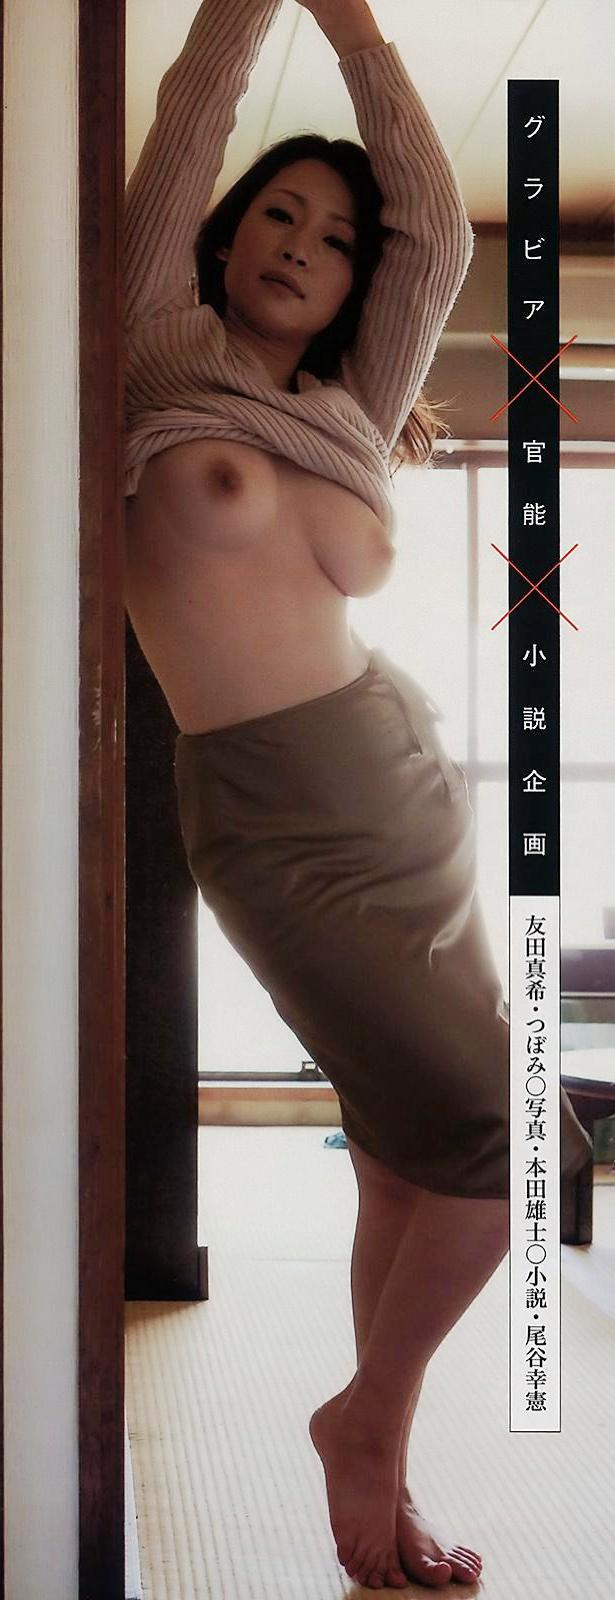 Japanese-AV-idol-Maki-Tomoda-www.ohfree.net-017 Japanese AV idol and actress Maki Tomoda 友田真希 ともだ まき leaked